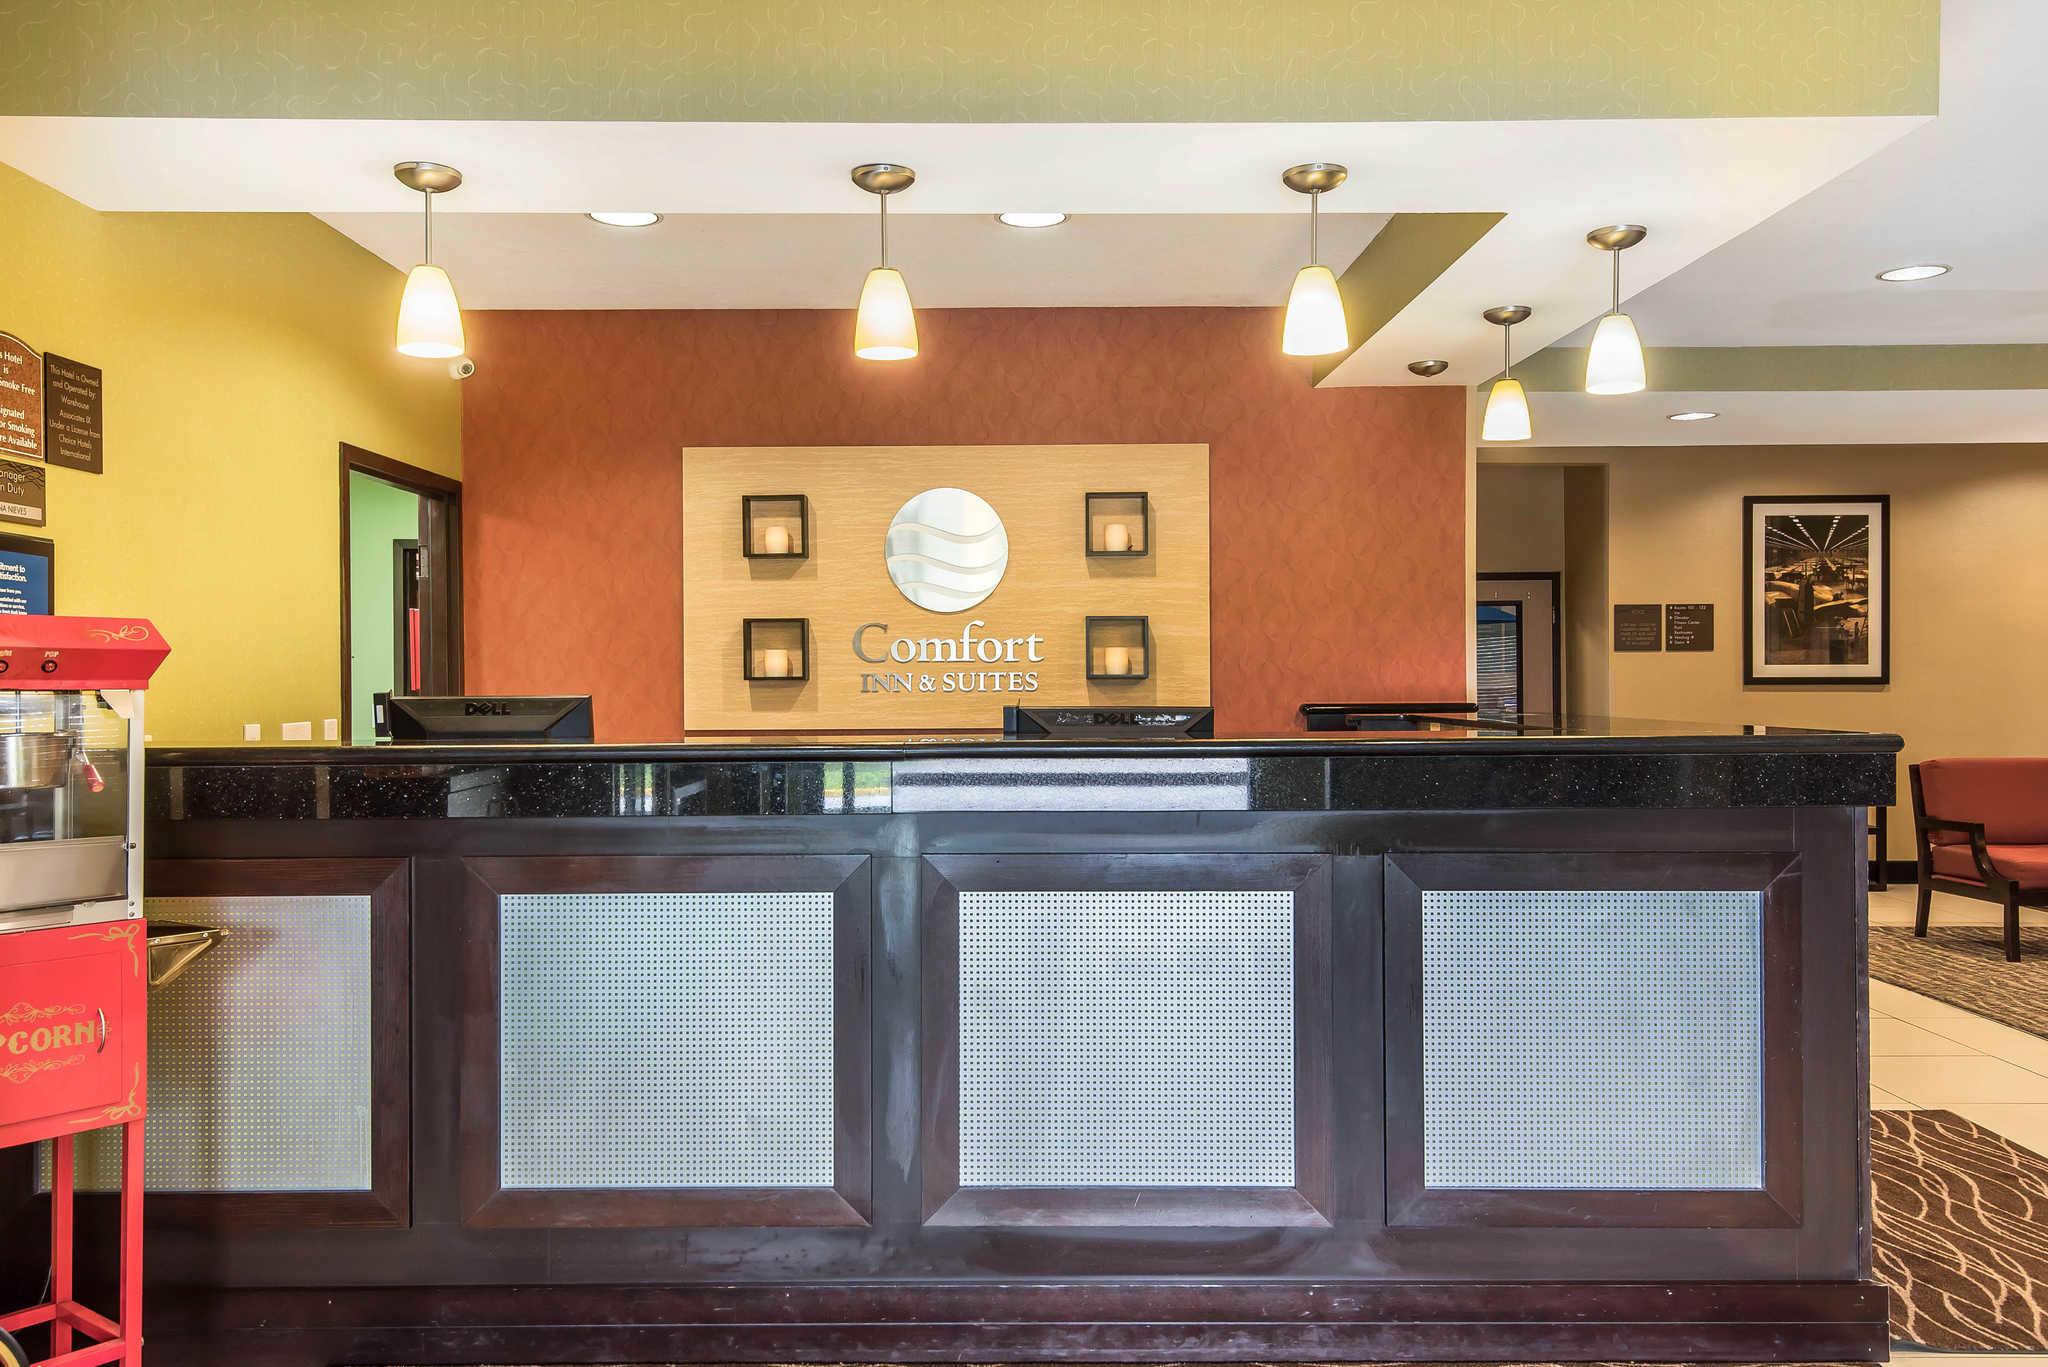 Comfort Inn & Suites Kansas City - Northeast image 4